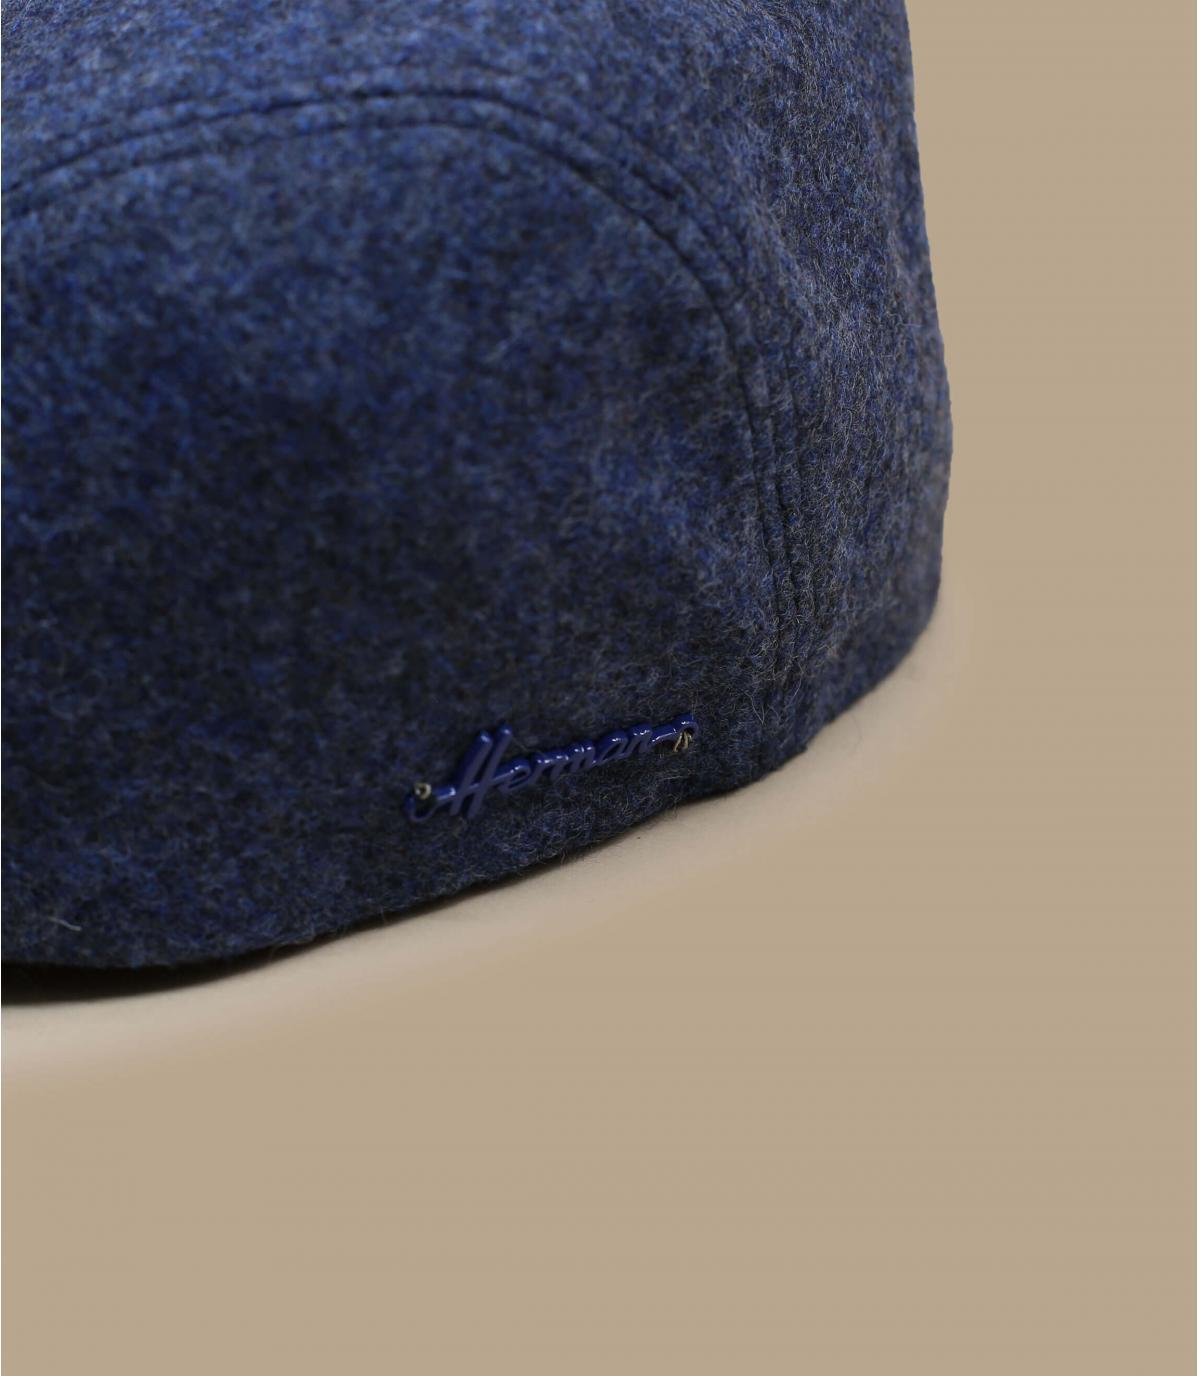 Detalles Hill wool EF blue imagen 2